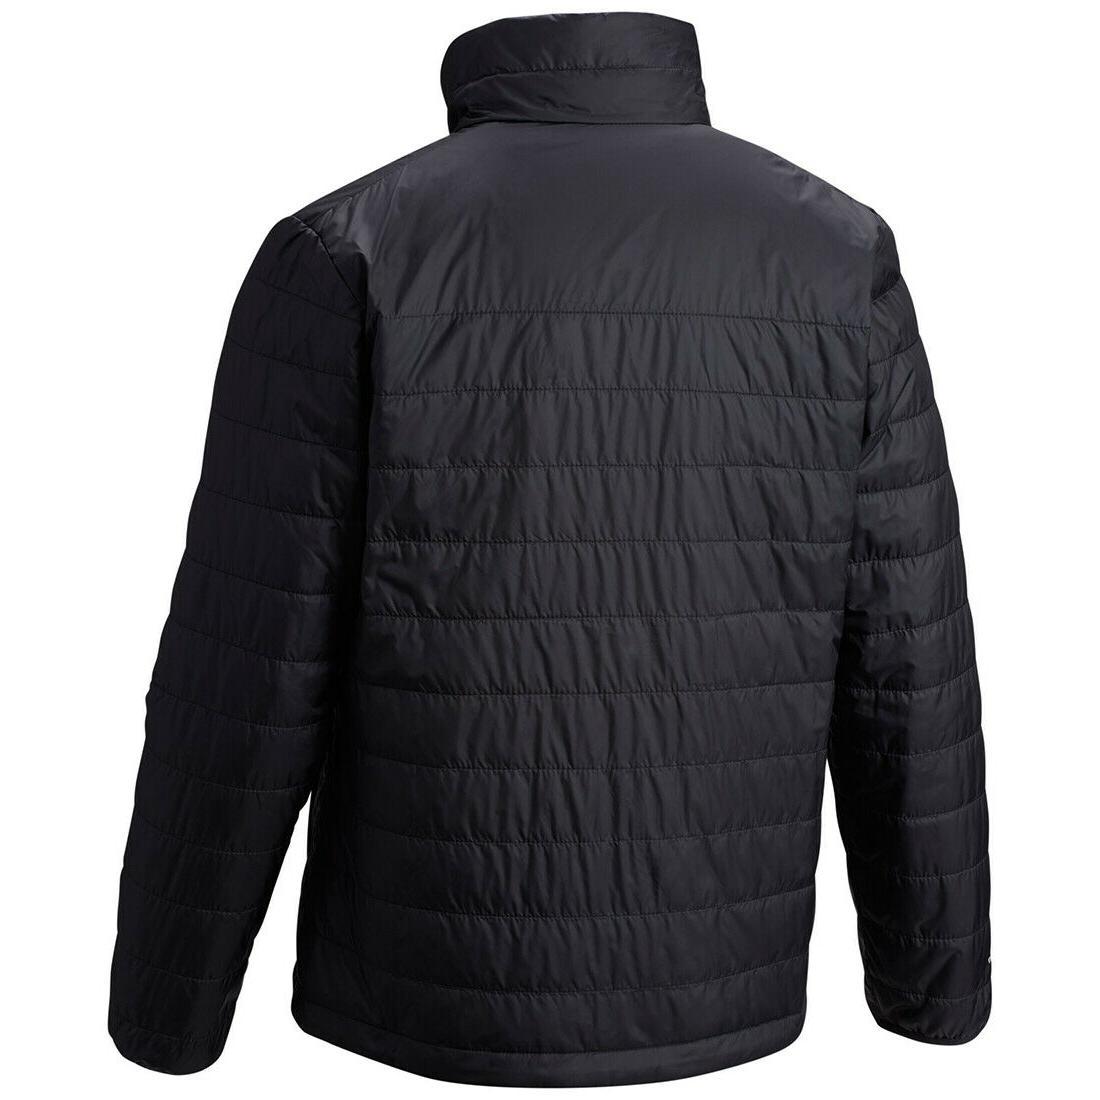 New Butte Omni-Heat Winter Coat